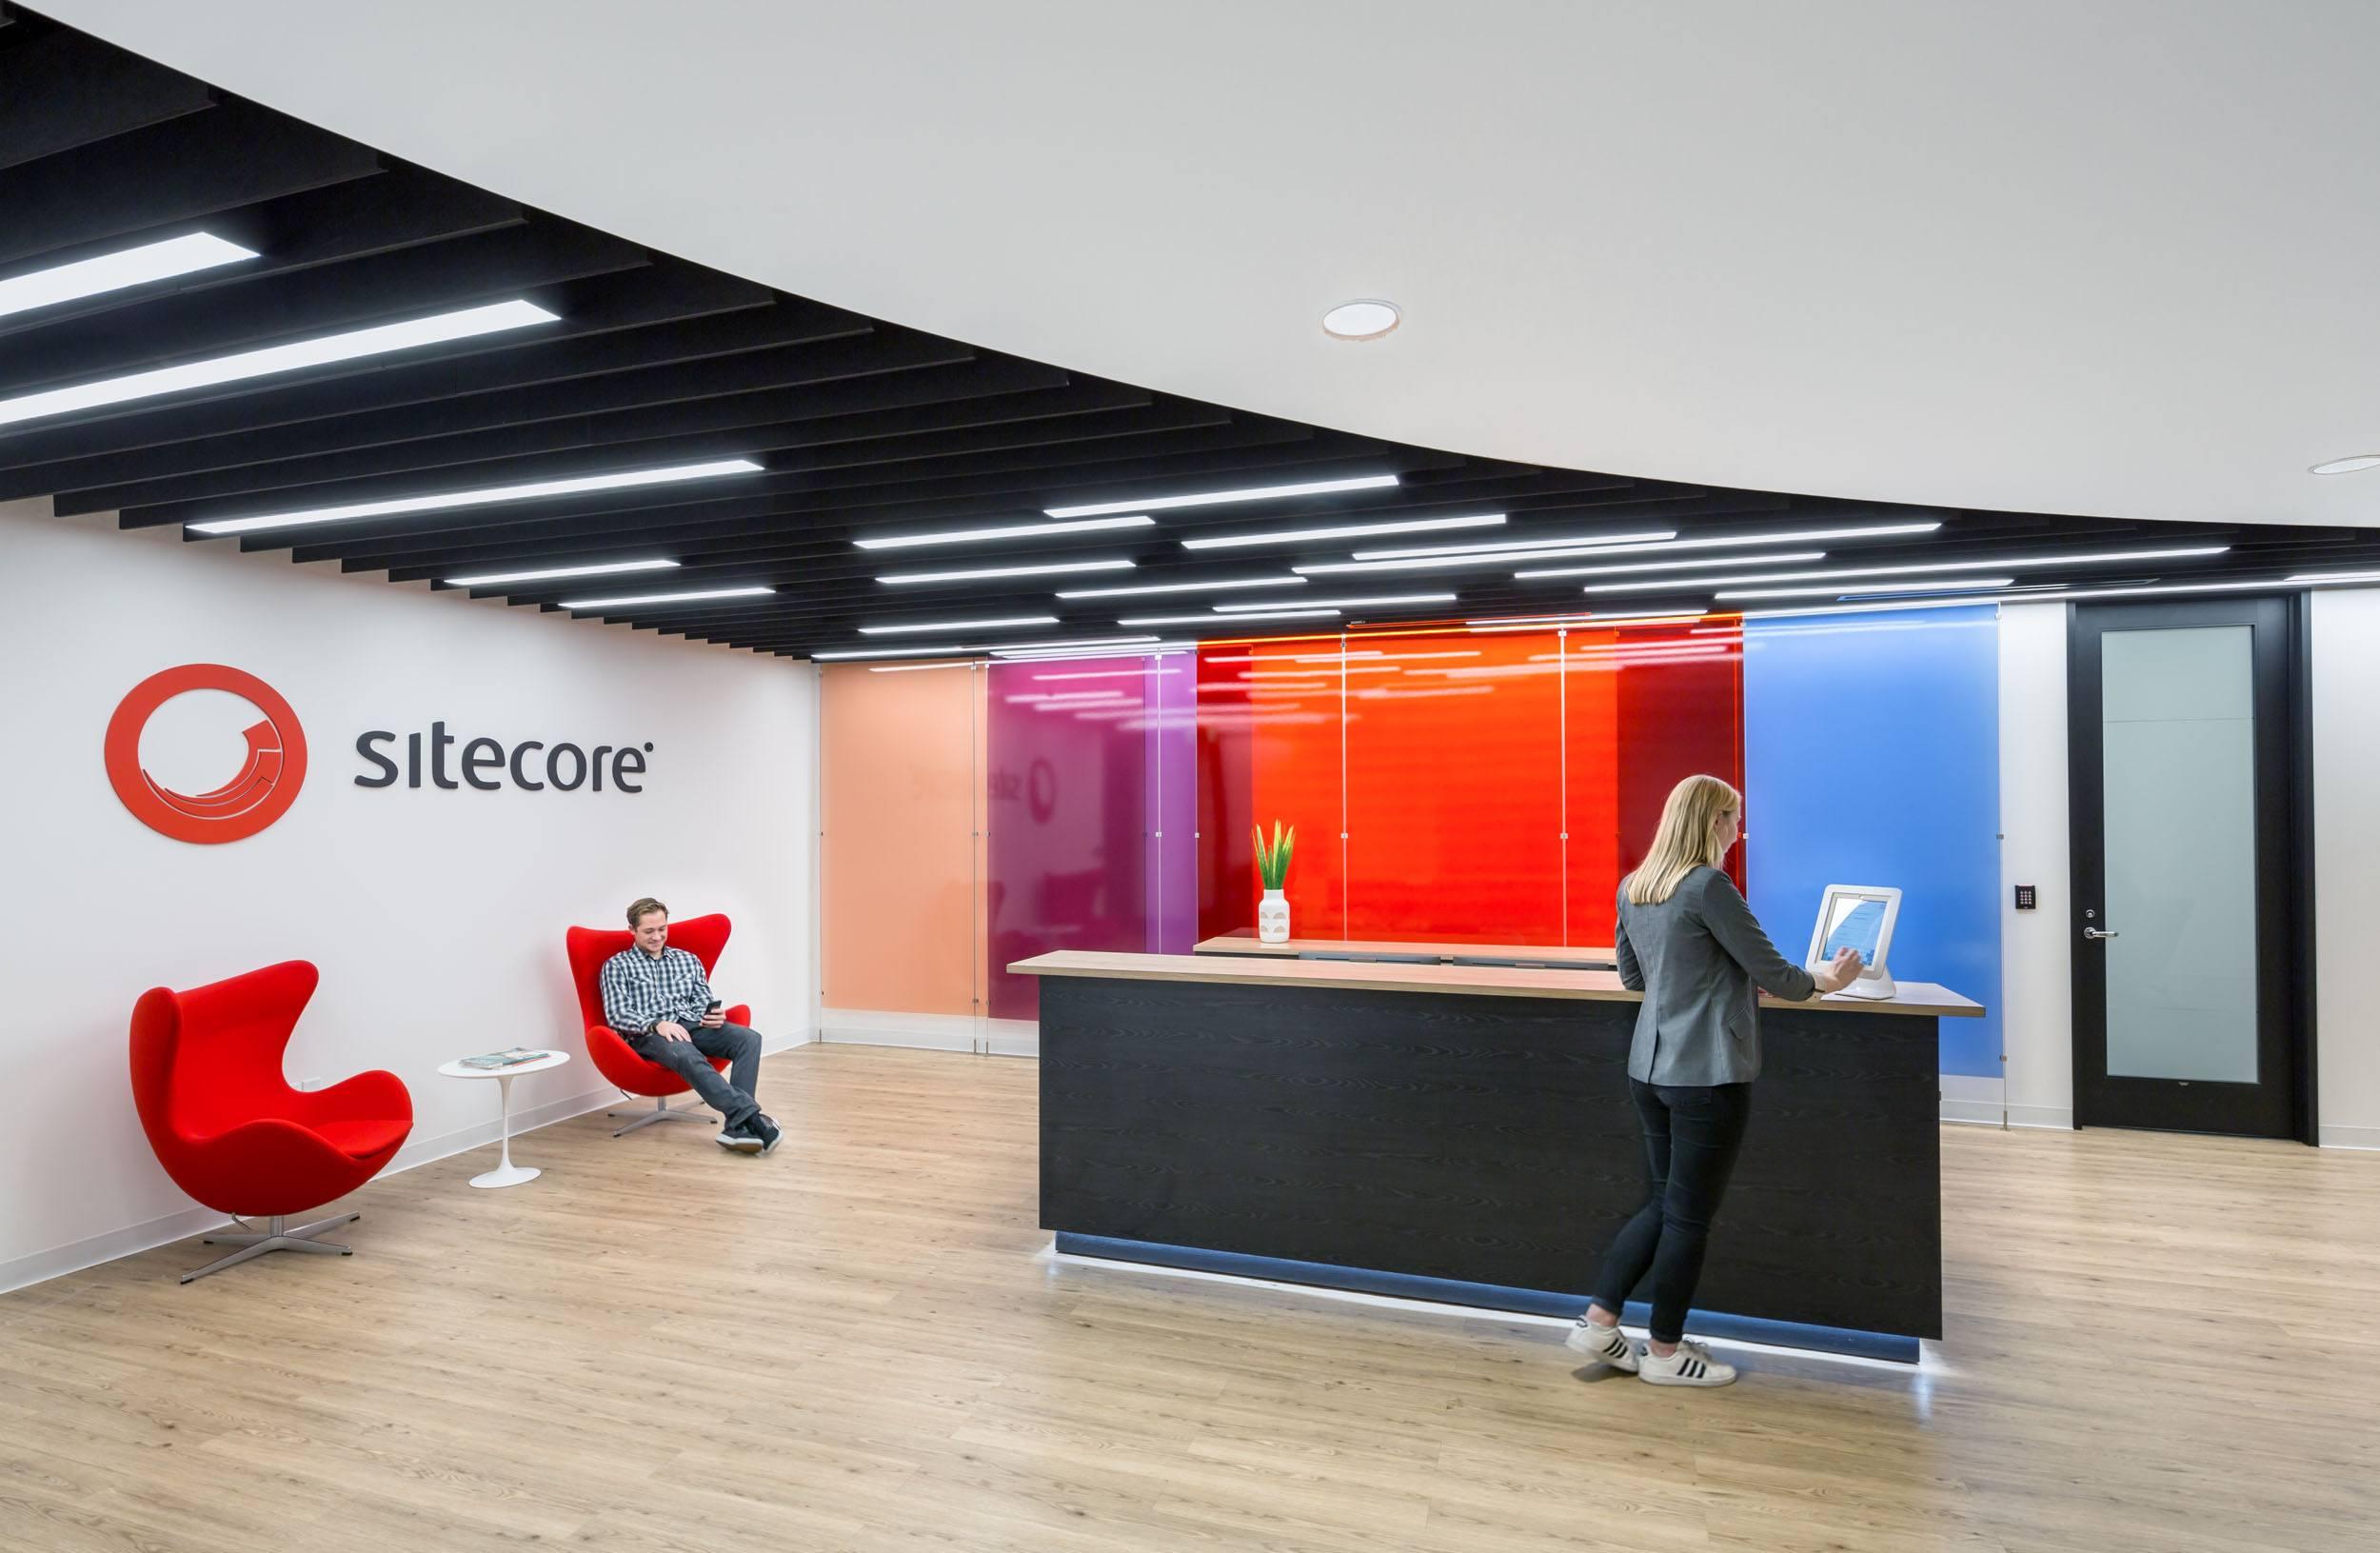 Sitecore offices interior lobby 2